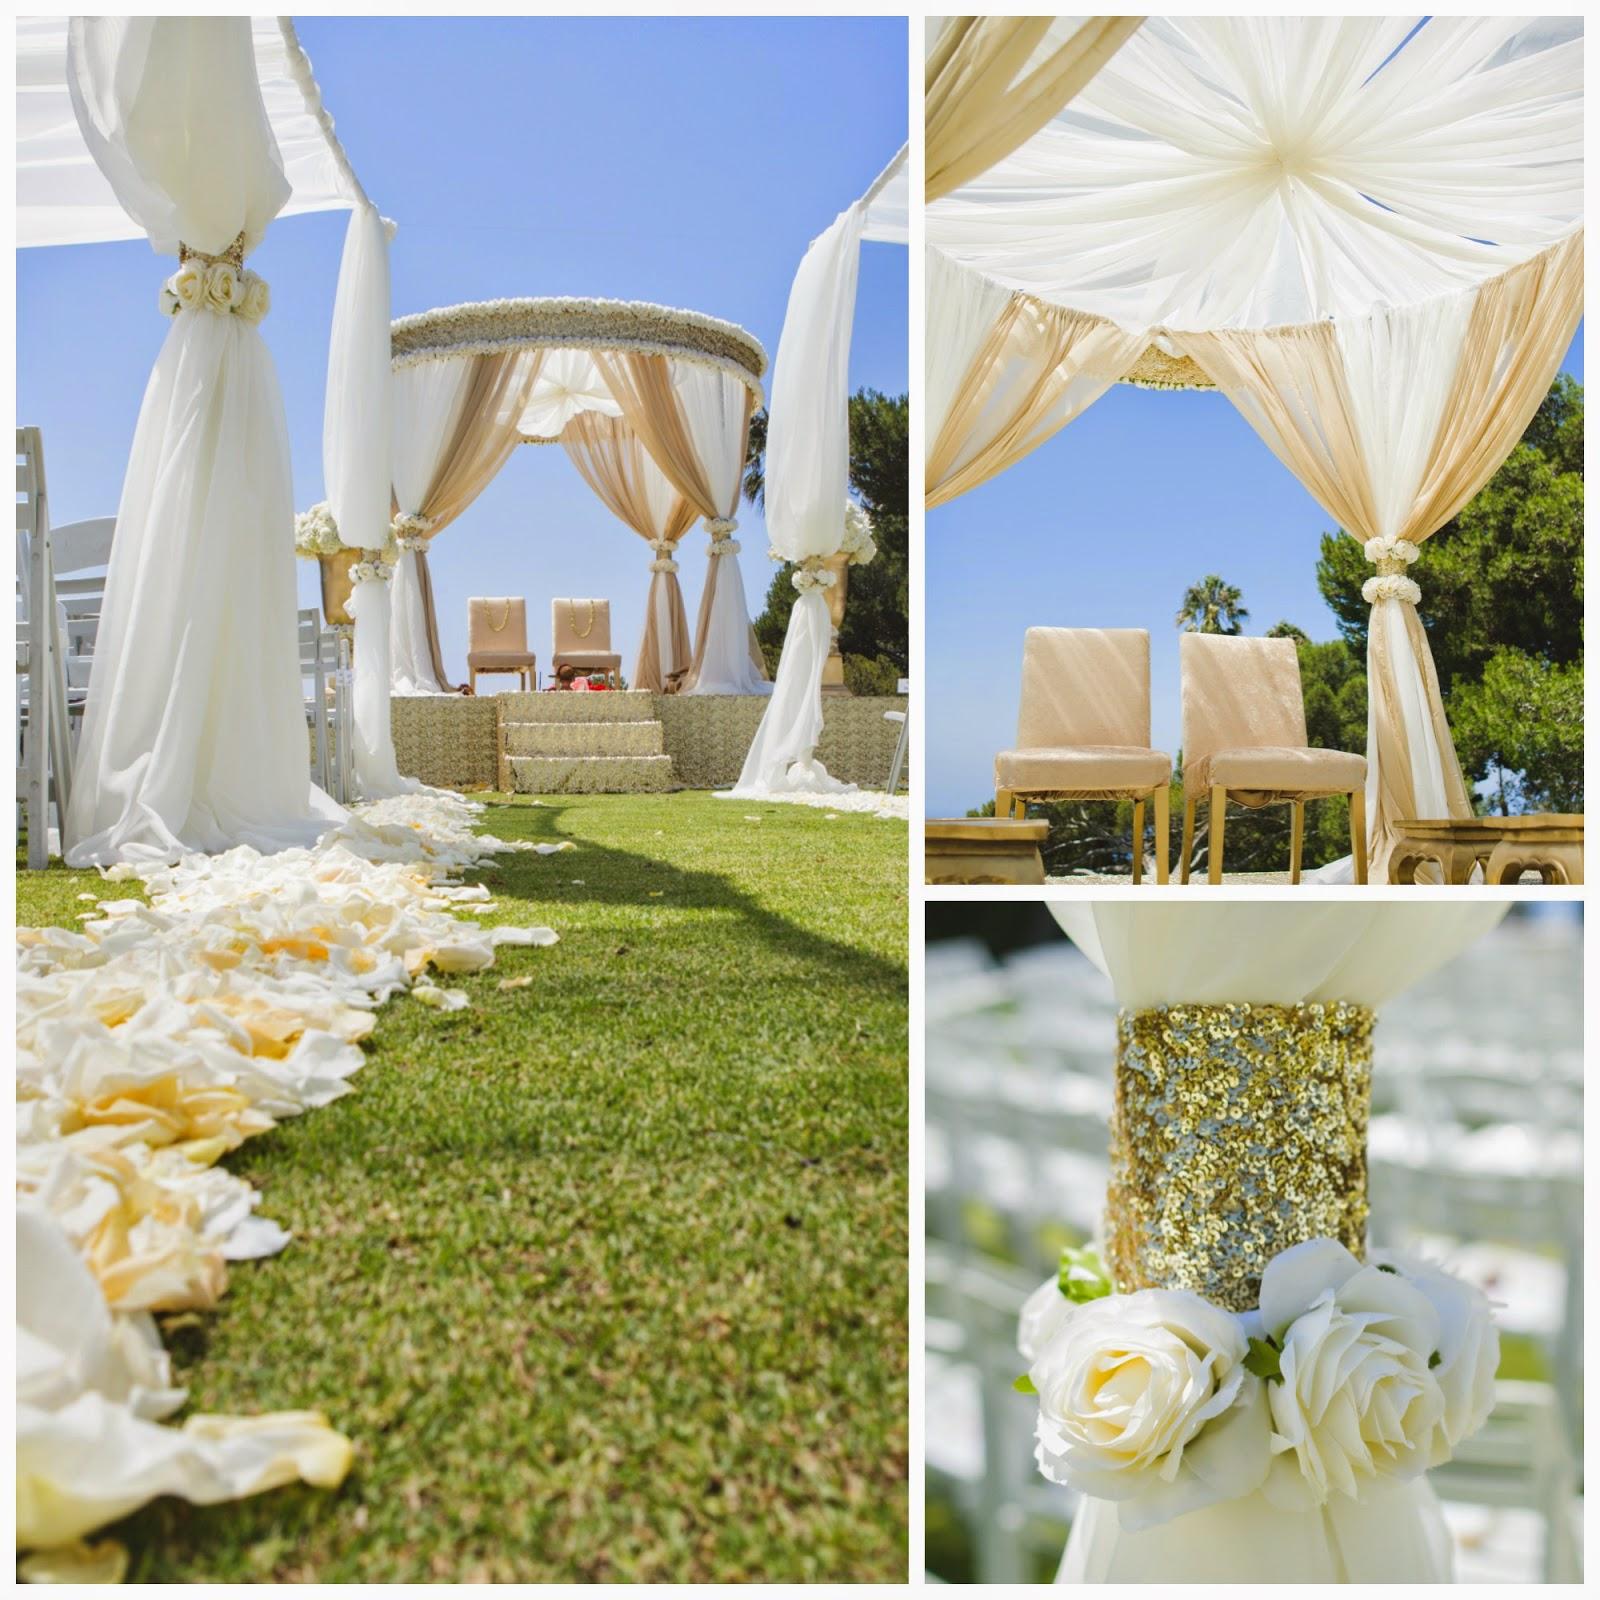 Black And Gold Wedding: Shawna Yamamoto Event Design: Gorgeous White, Black, And